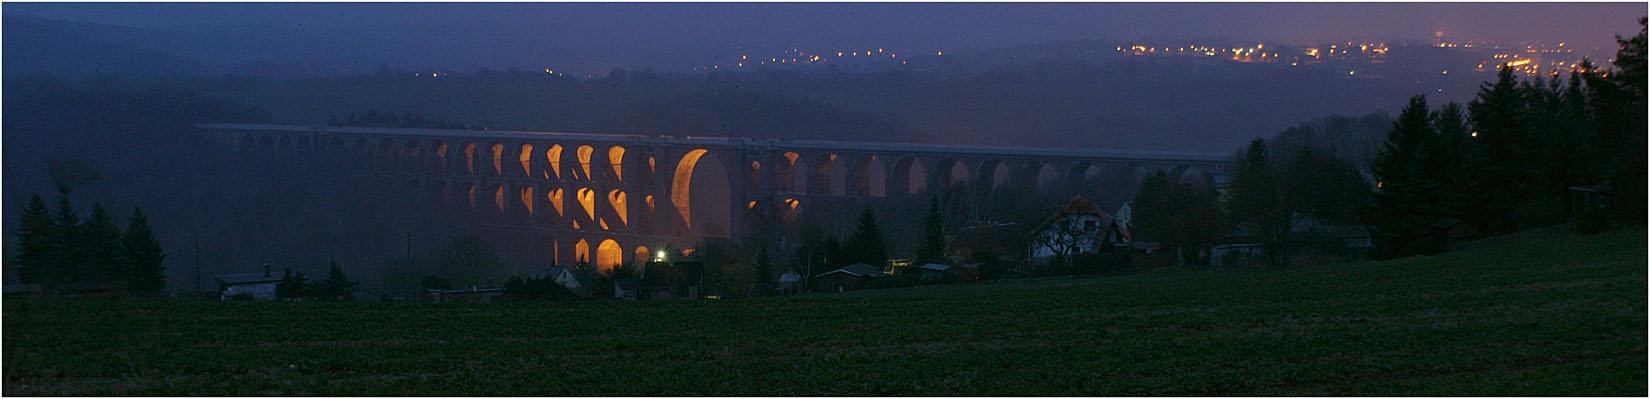 Göltschtalbrücke am Abend